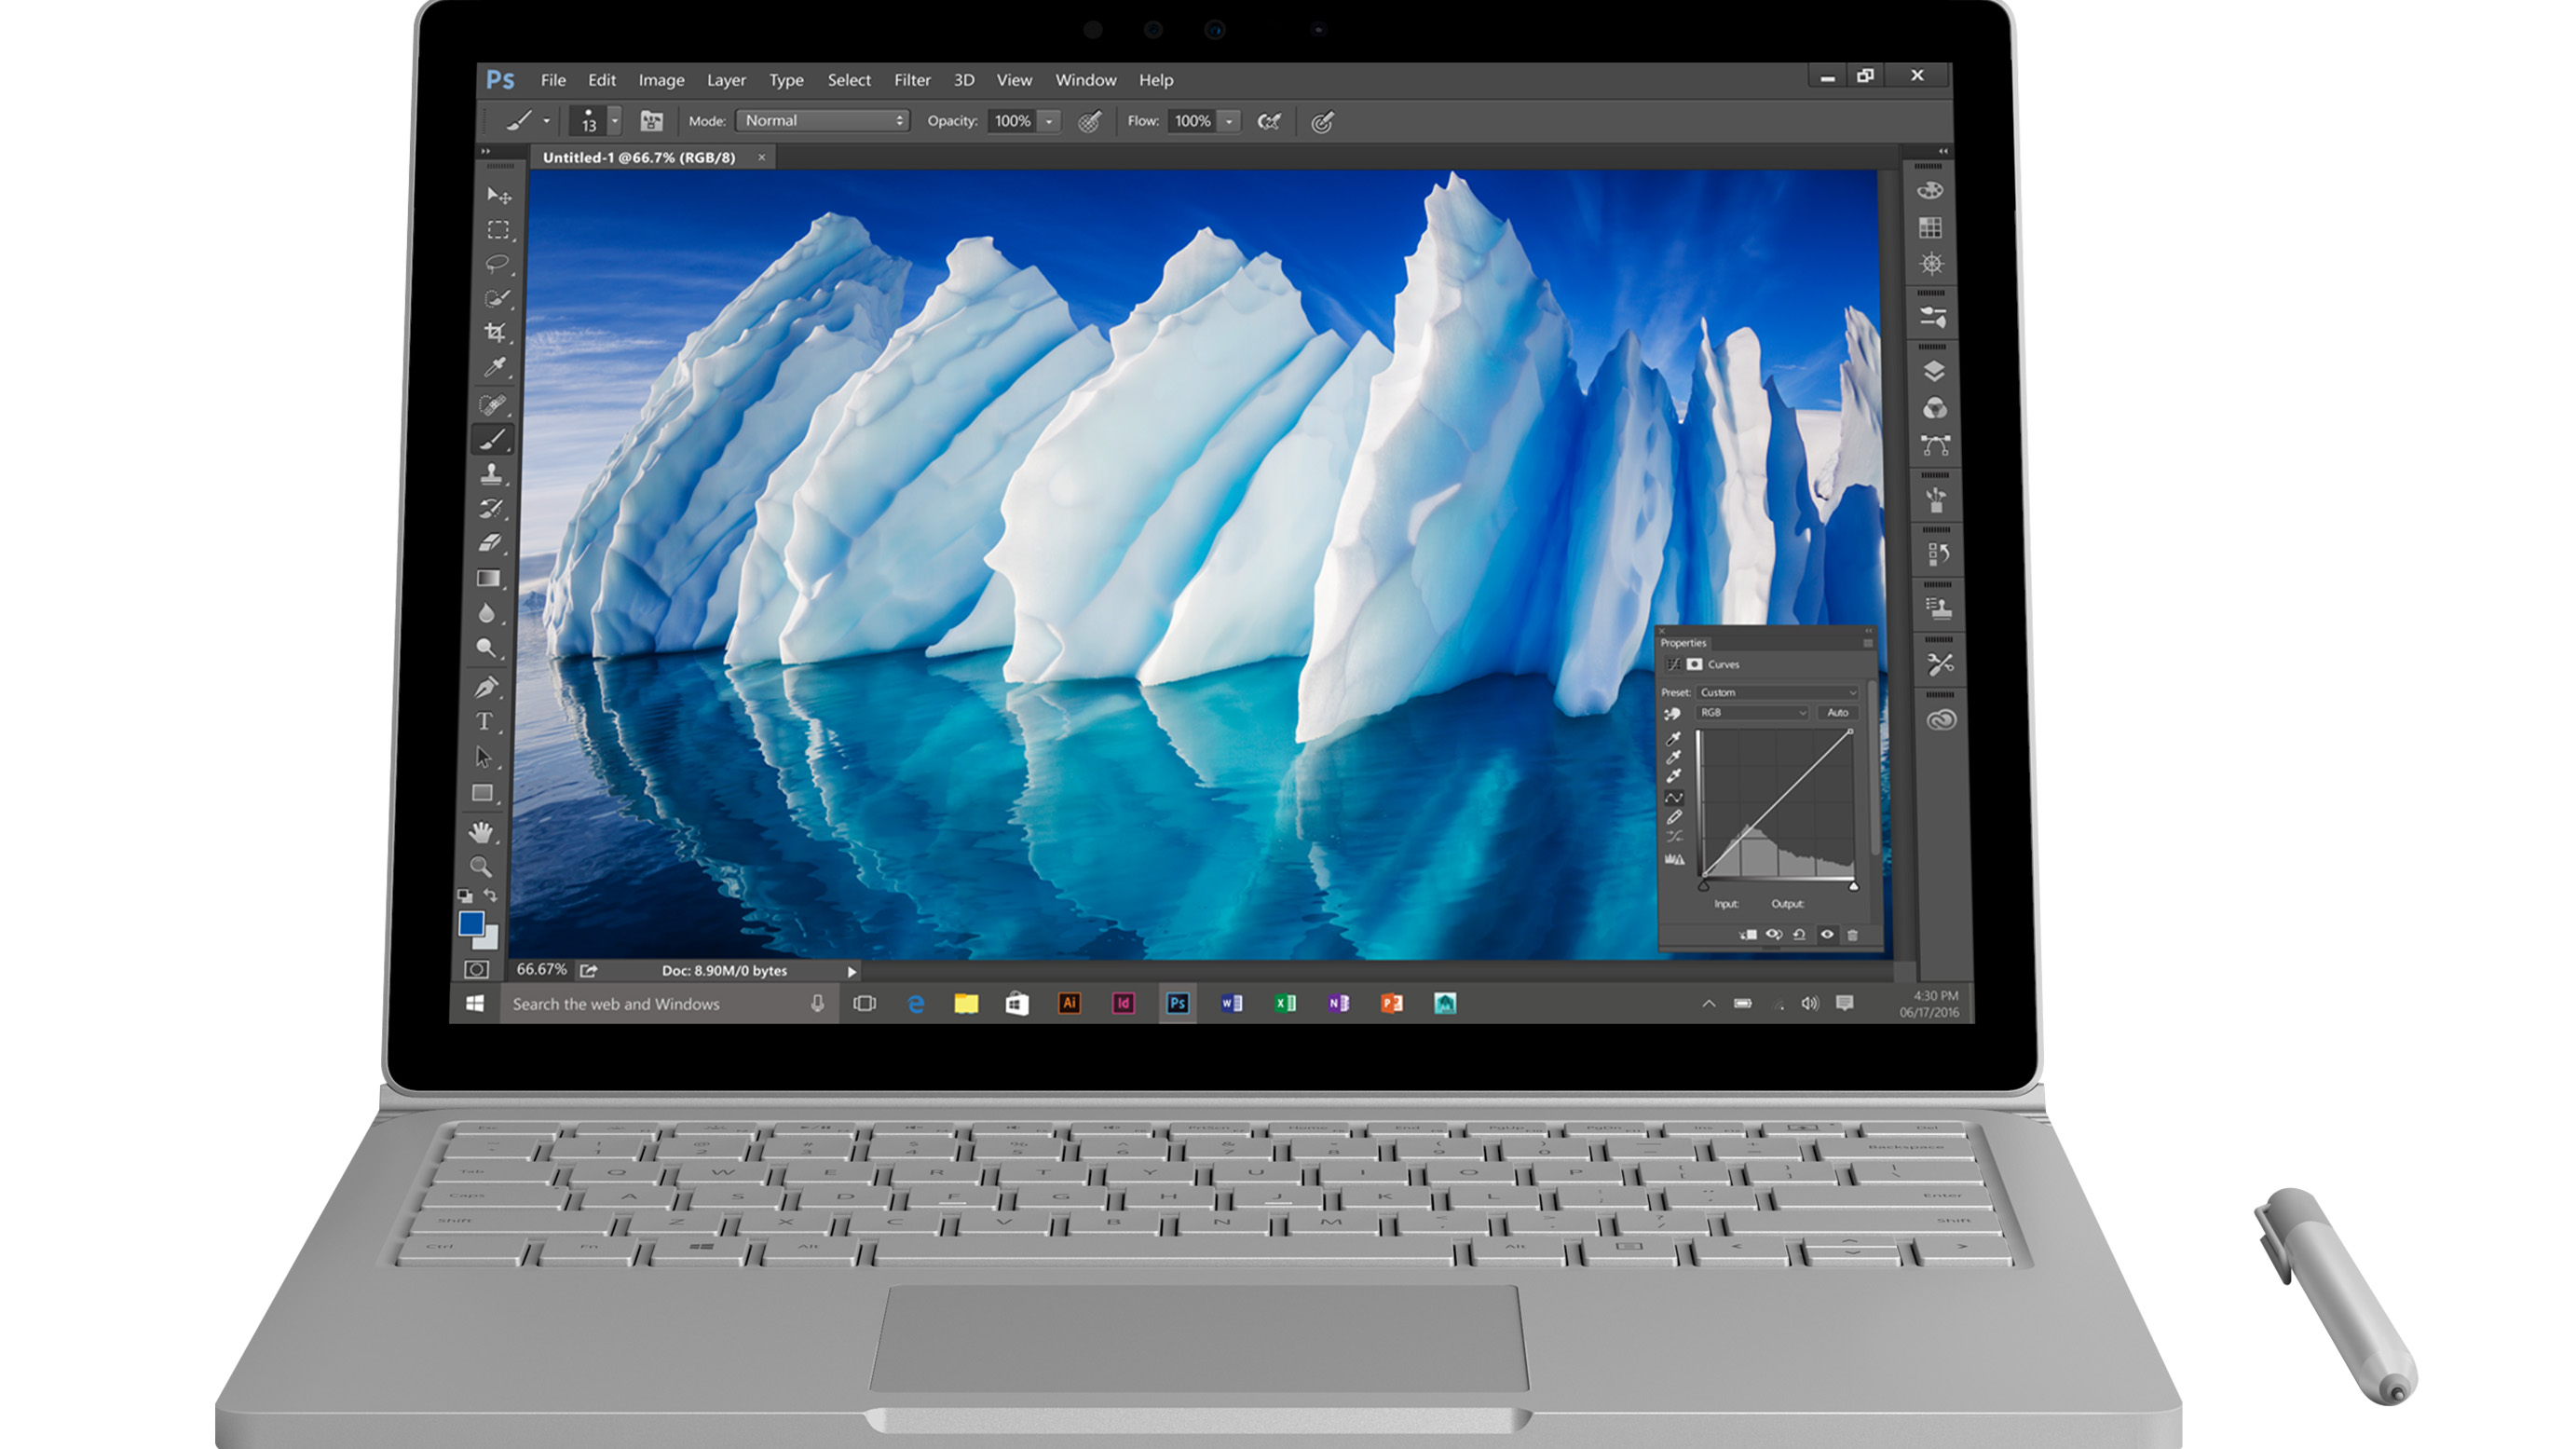 Microsoft Surface Book 256GB i7 8GB GPU2 Commercial